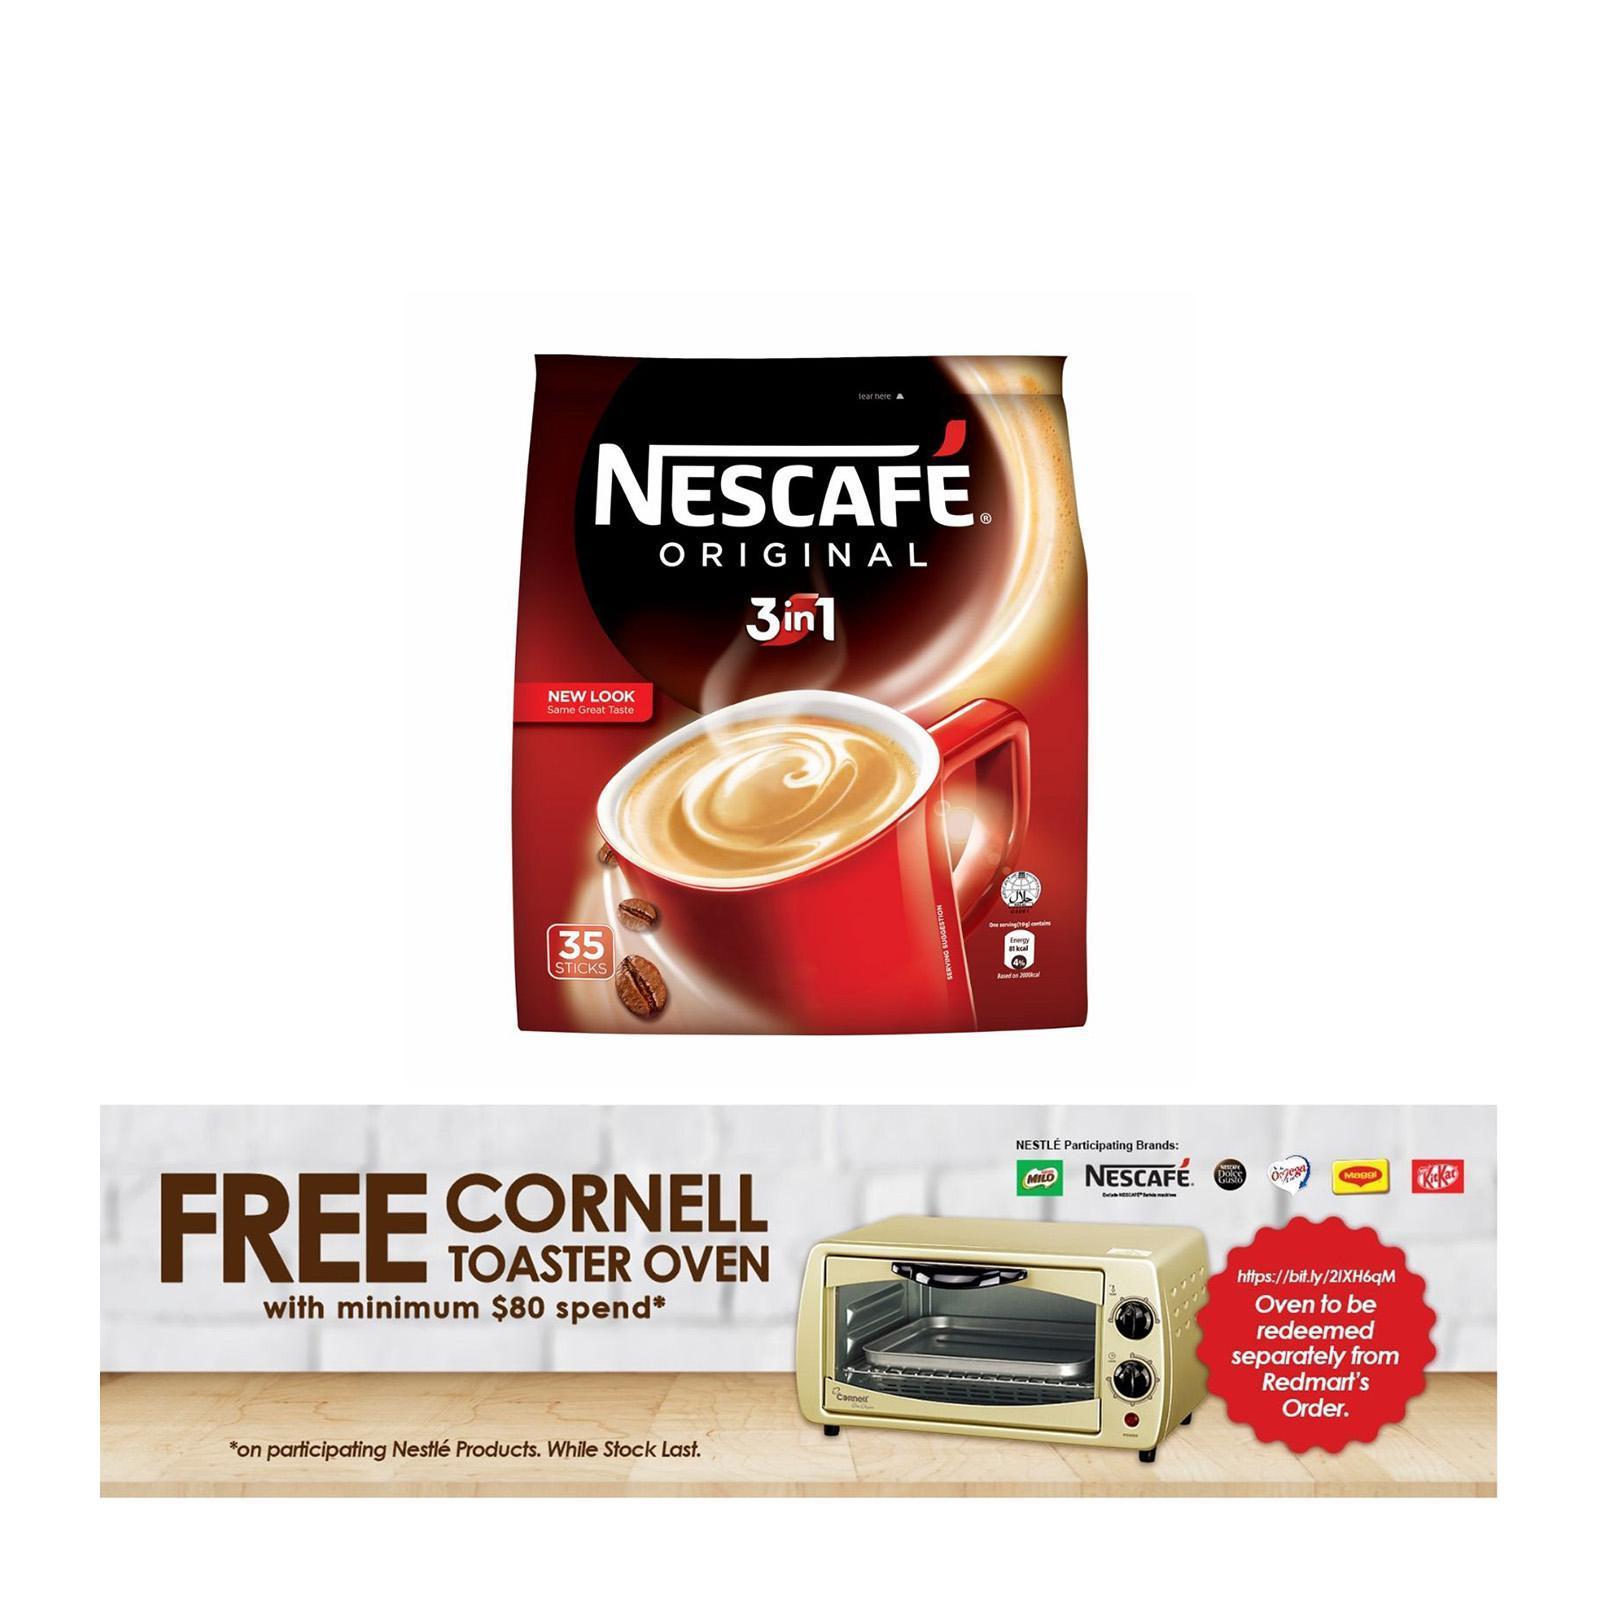 Nescafe Original 3 in 1 Instant Coffee